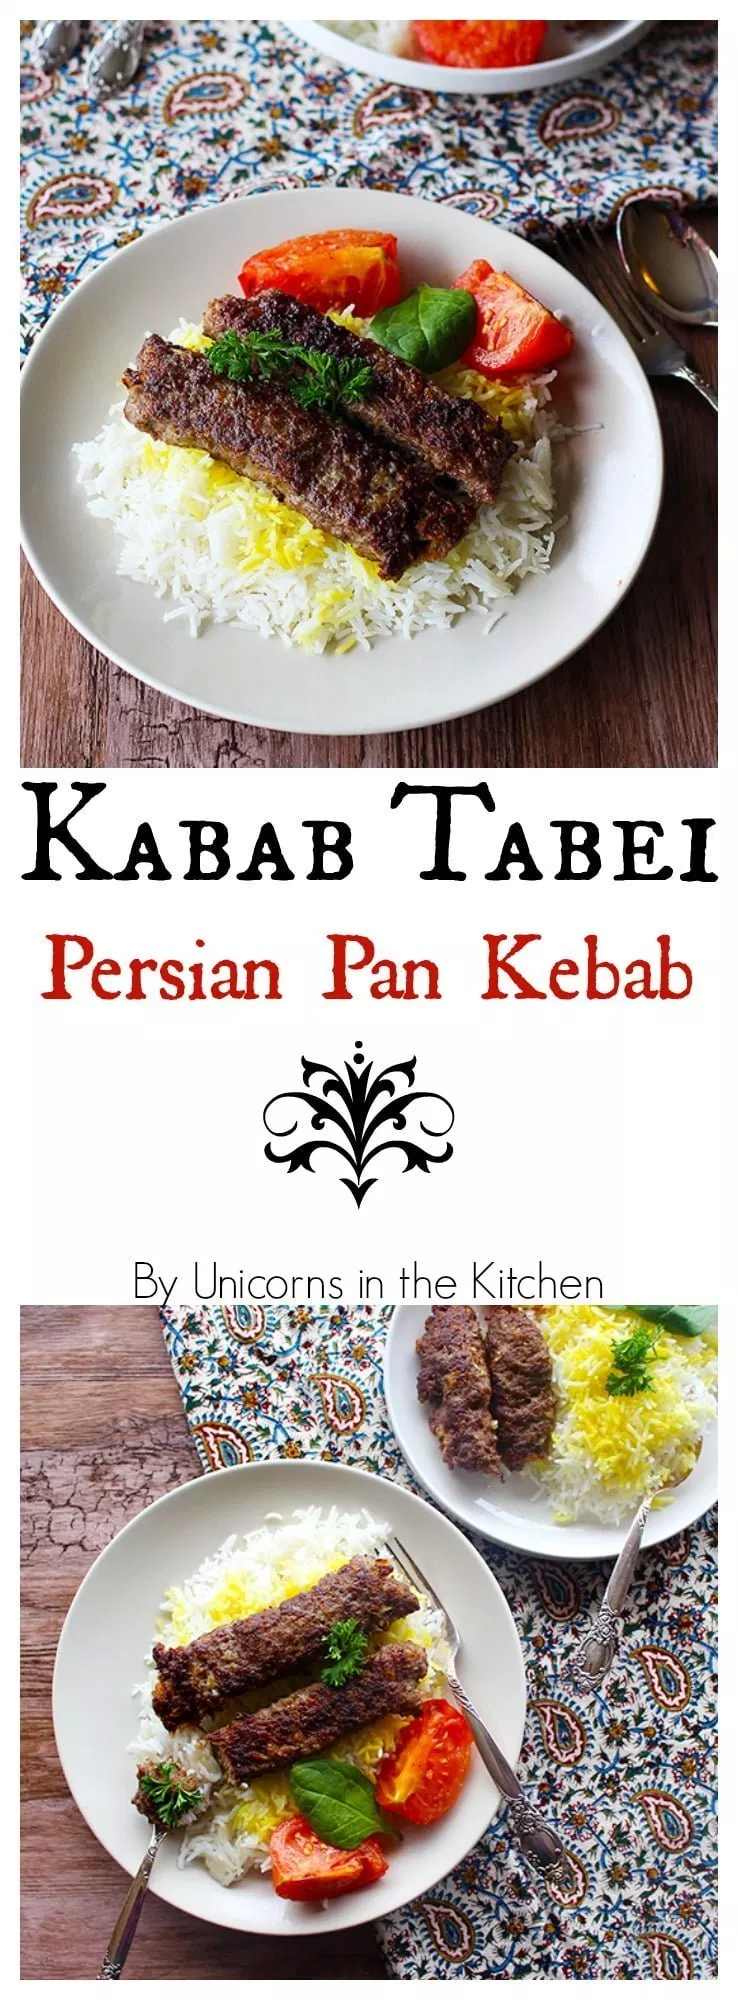 Kabab Tabei Persian Pan Kebab Unicorns In The Kitchen Kebab Supper Recipes Recipes